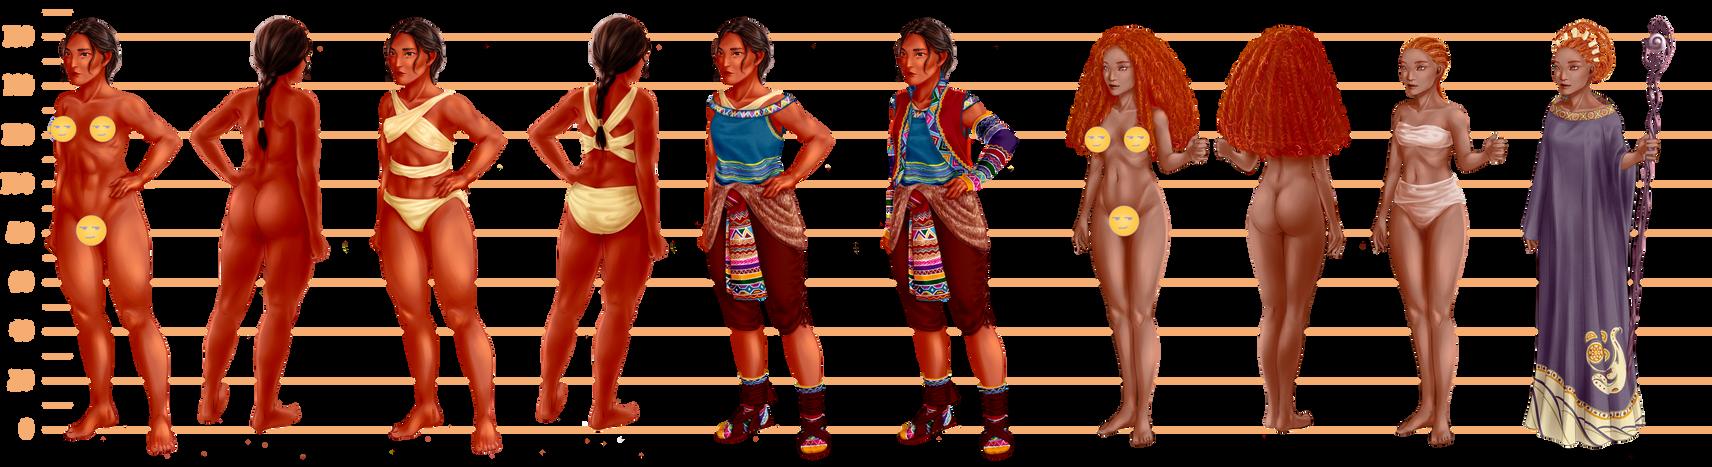 Character Design Research : Character design research by fayen ri on deviantart